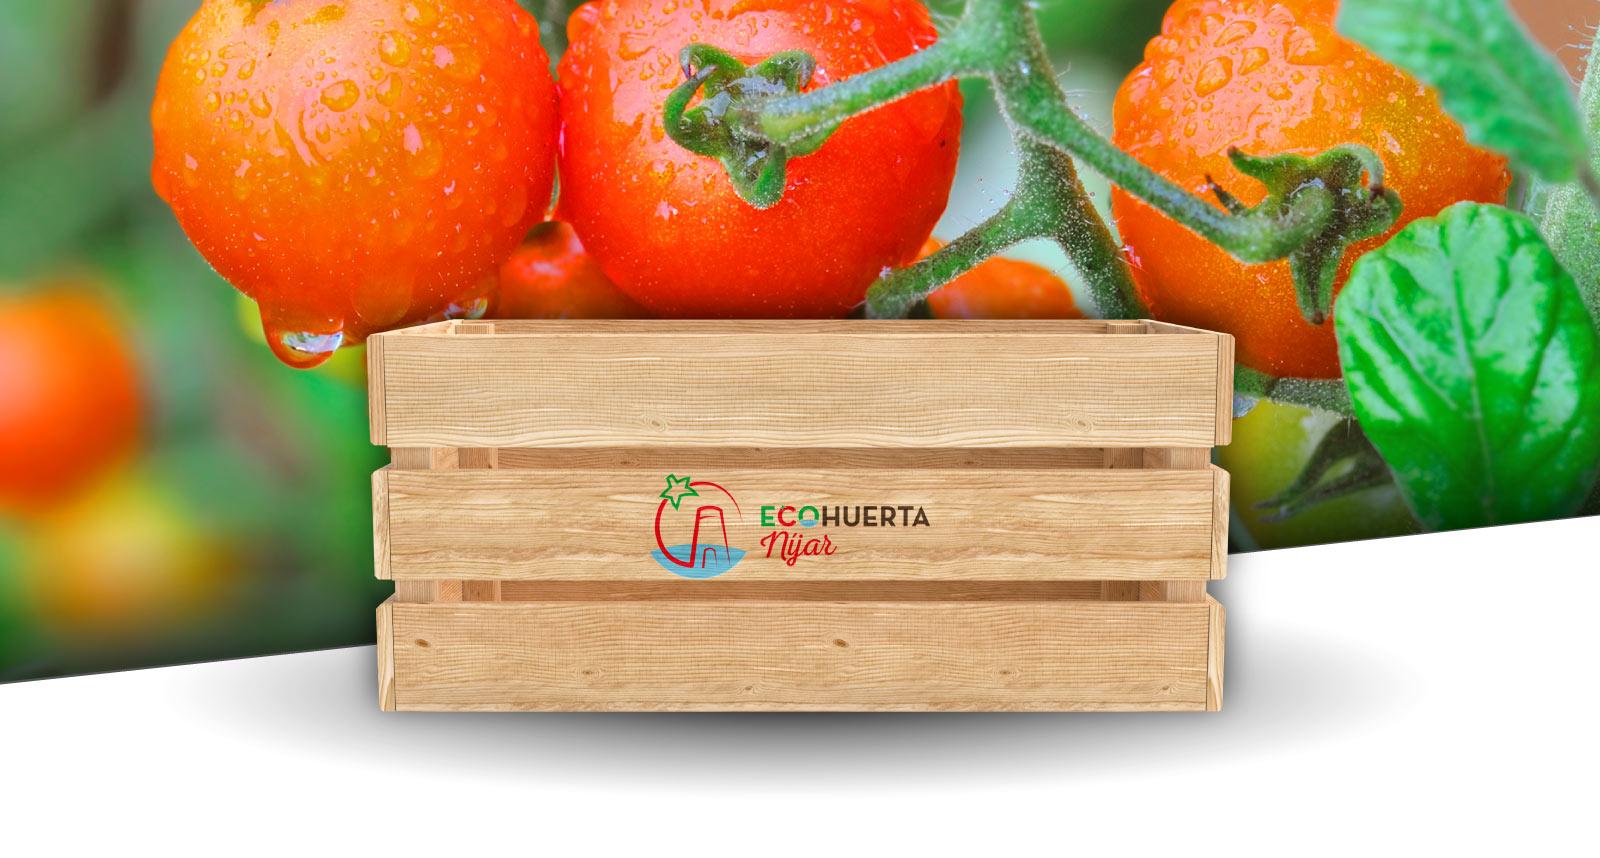 Diseño gráfico para EcoHuerta Níjar